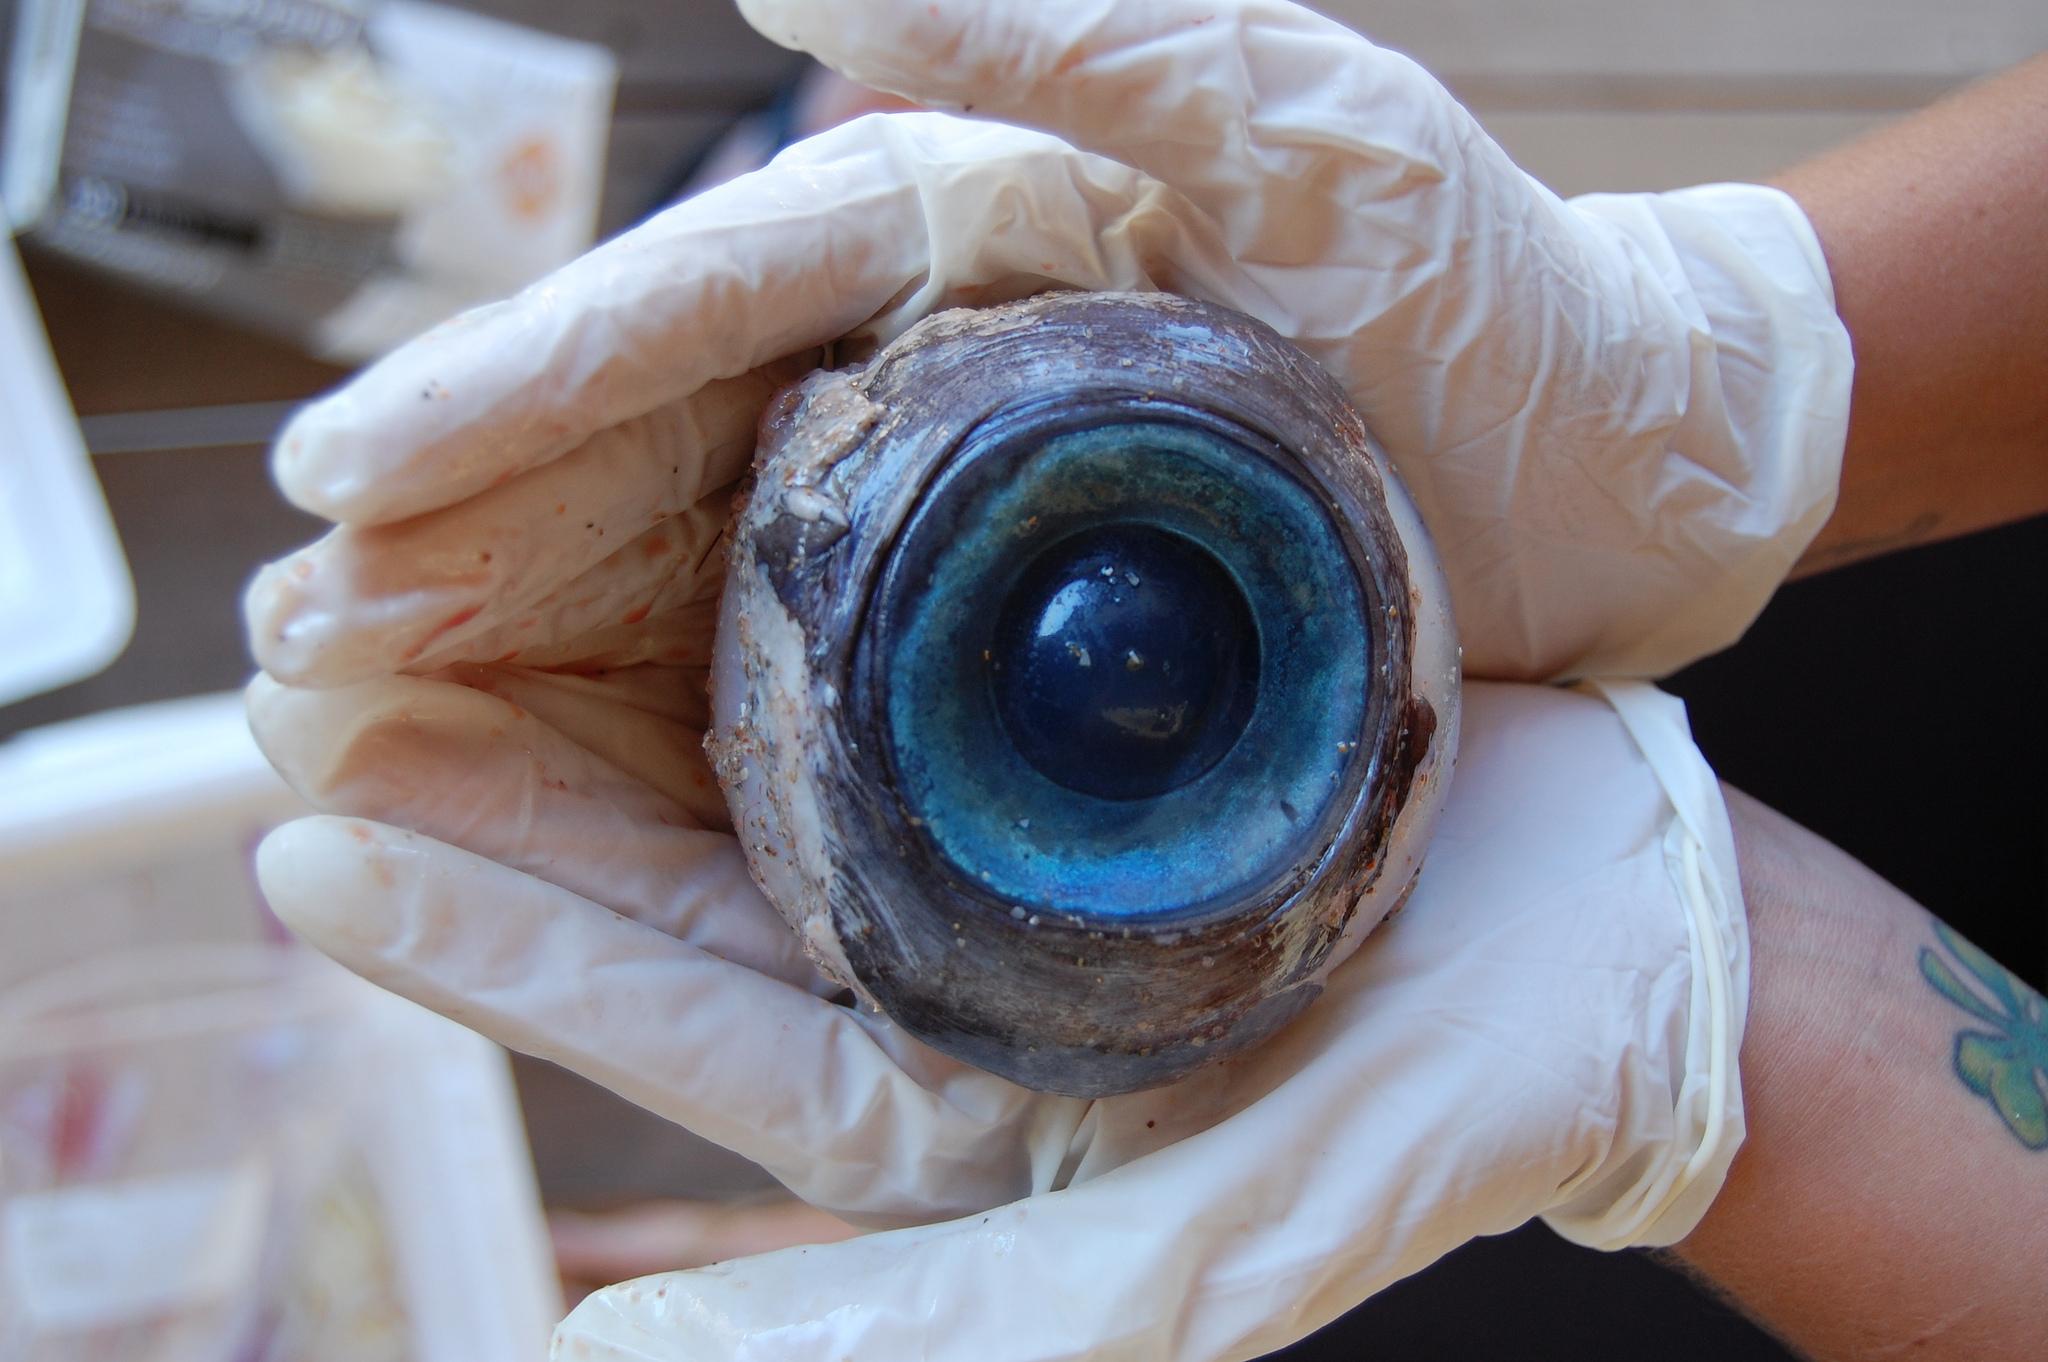 Hallan ojo gigante de monstruo submarino